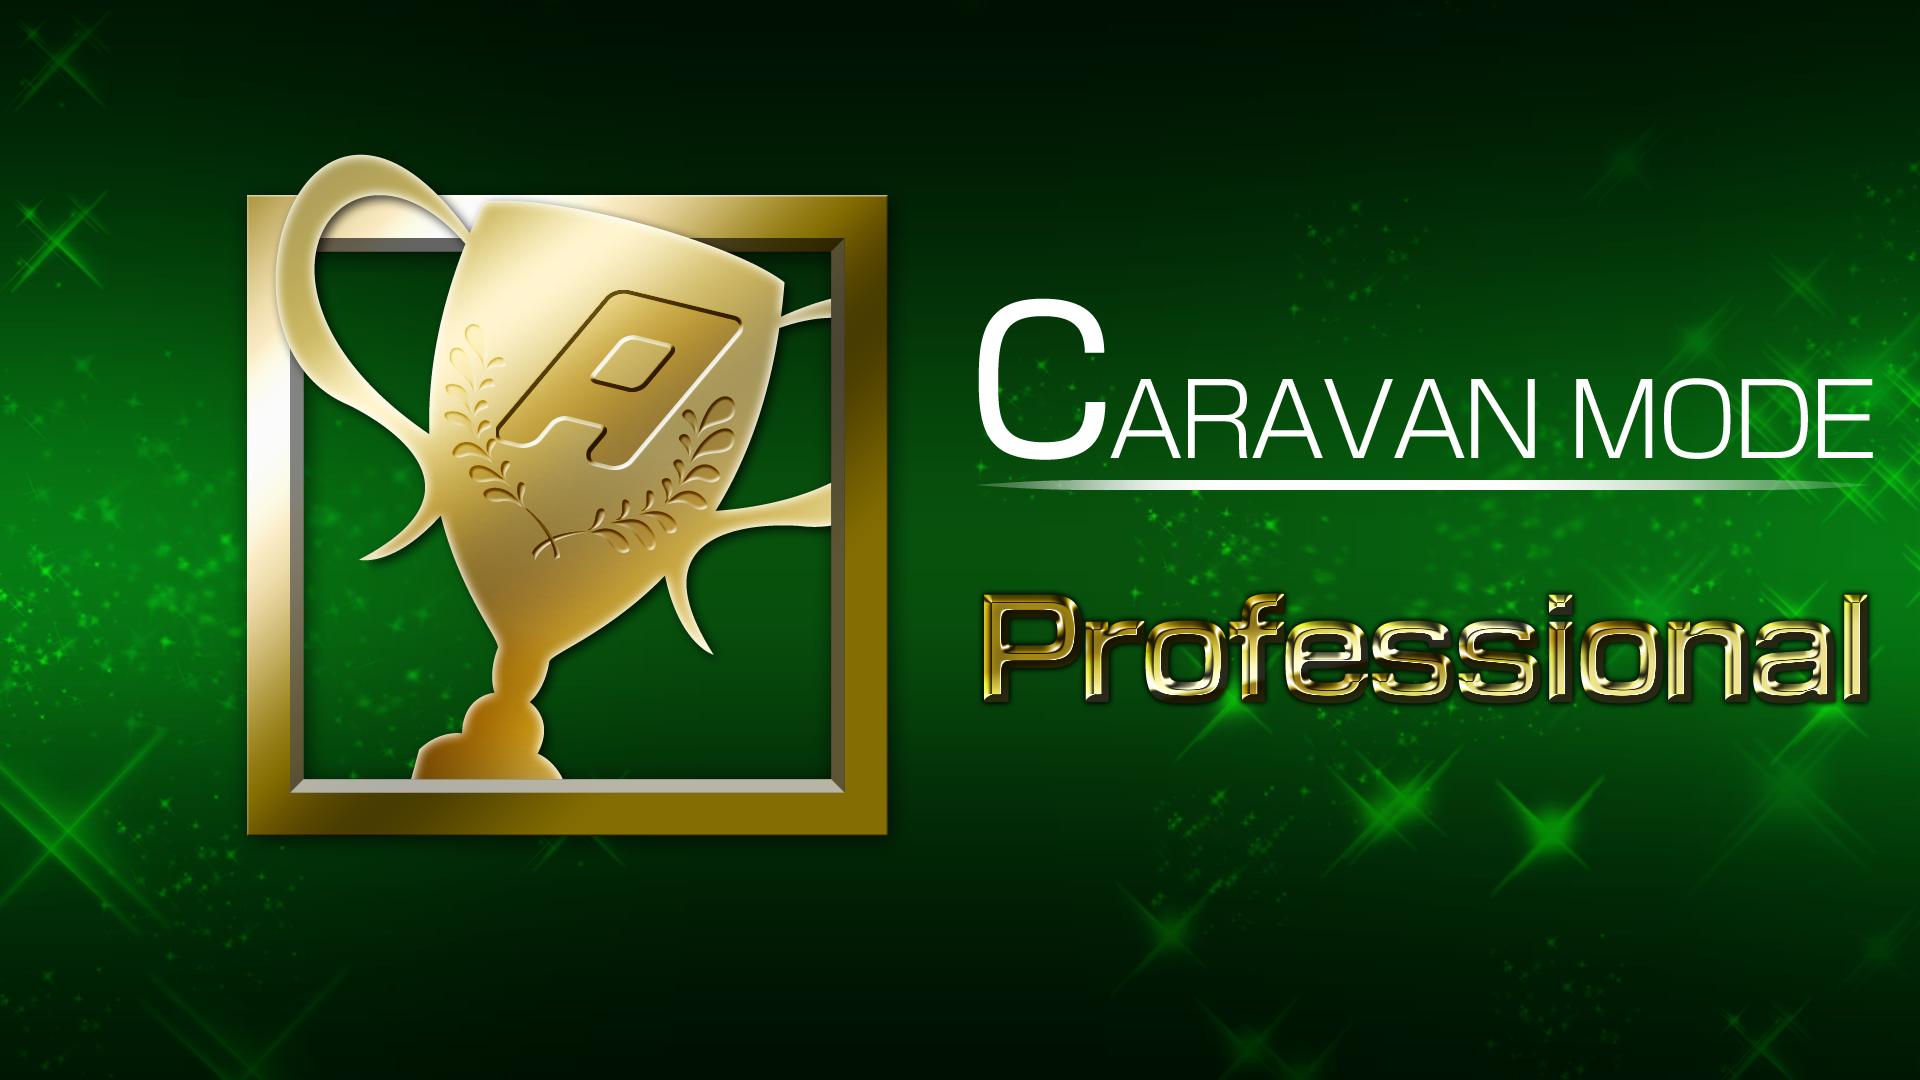 Icon for CARAVAN MODE 3 win(s)